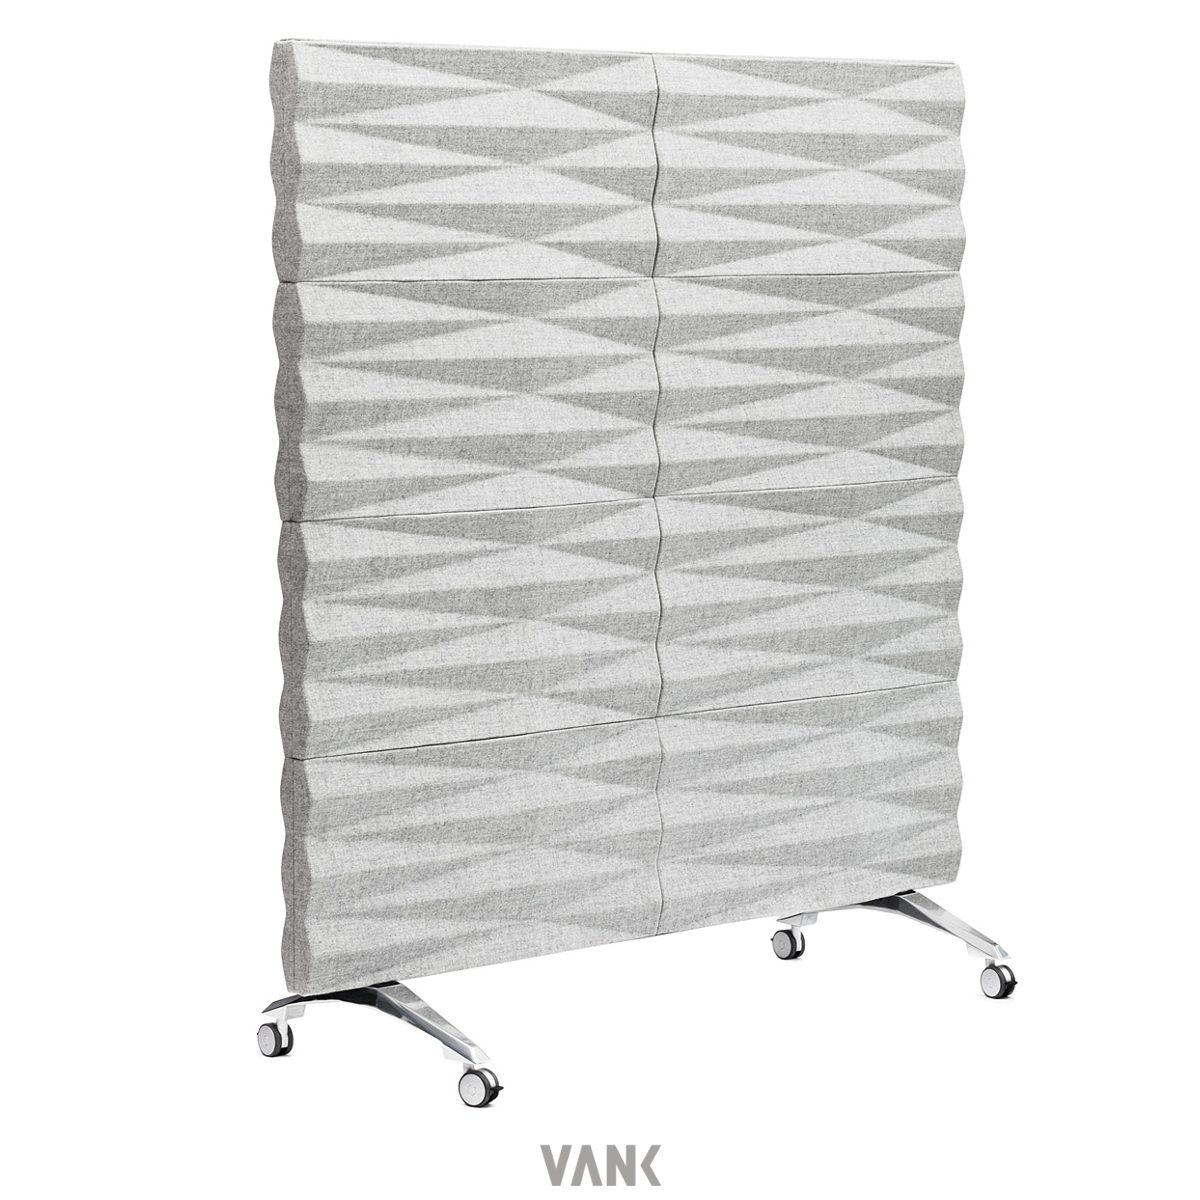 VANK wall 2